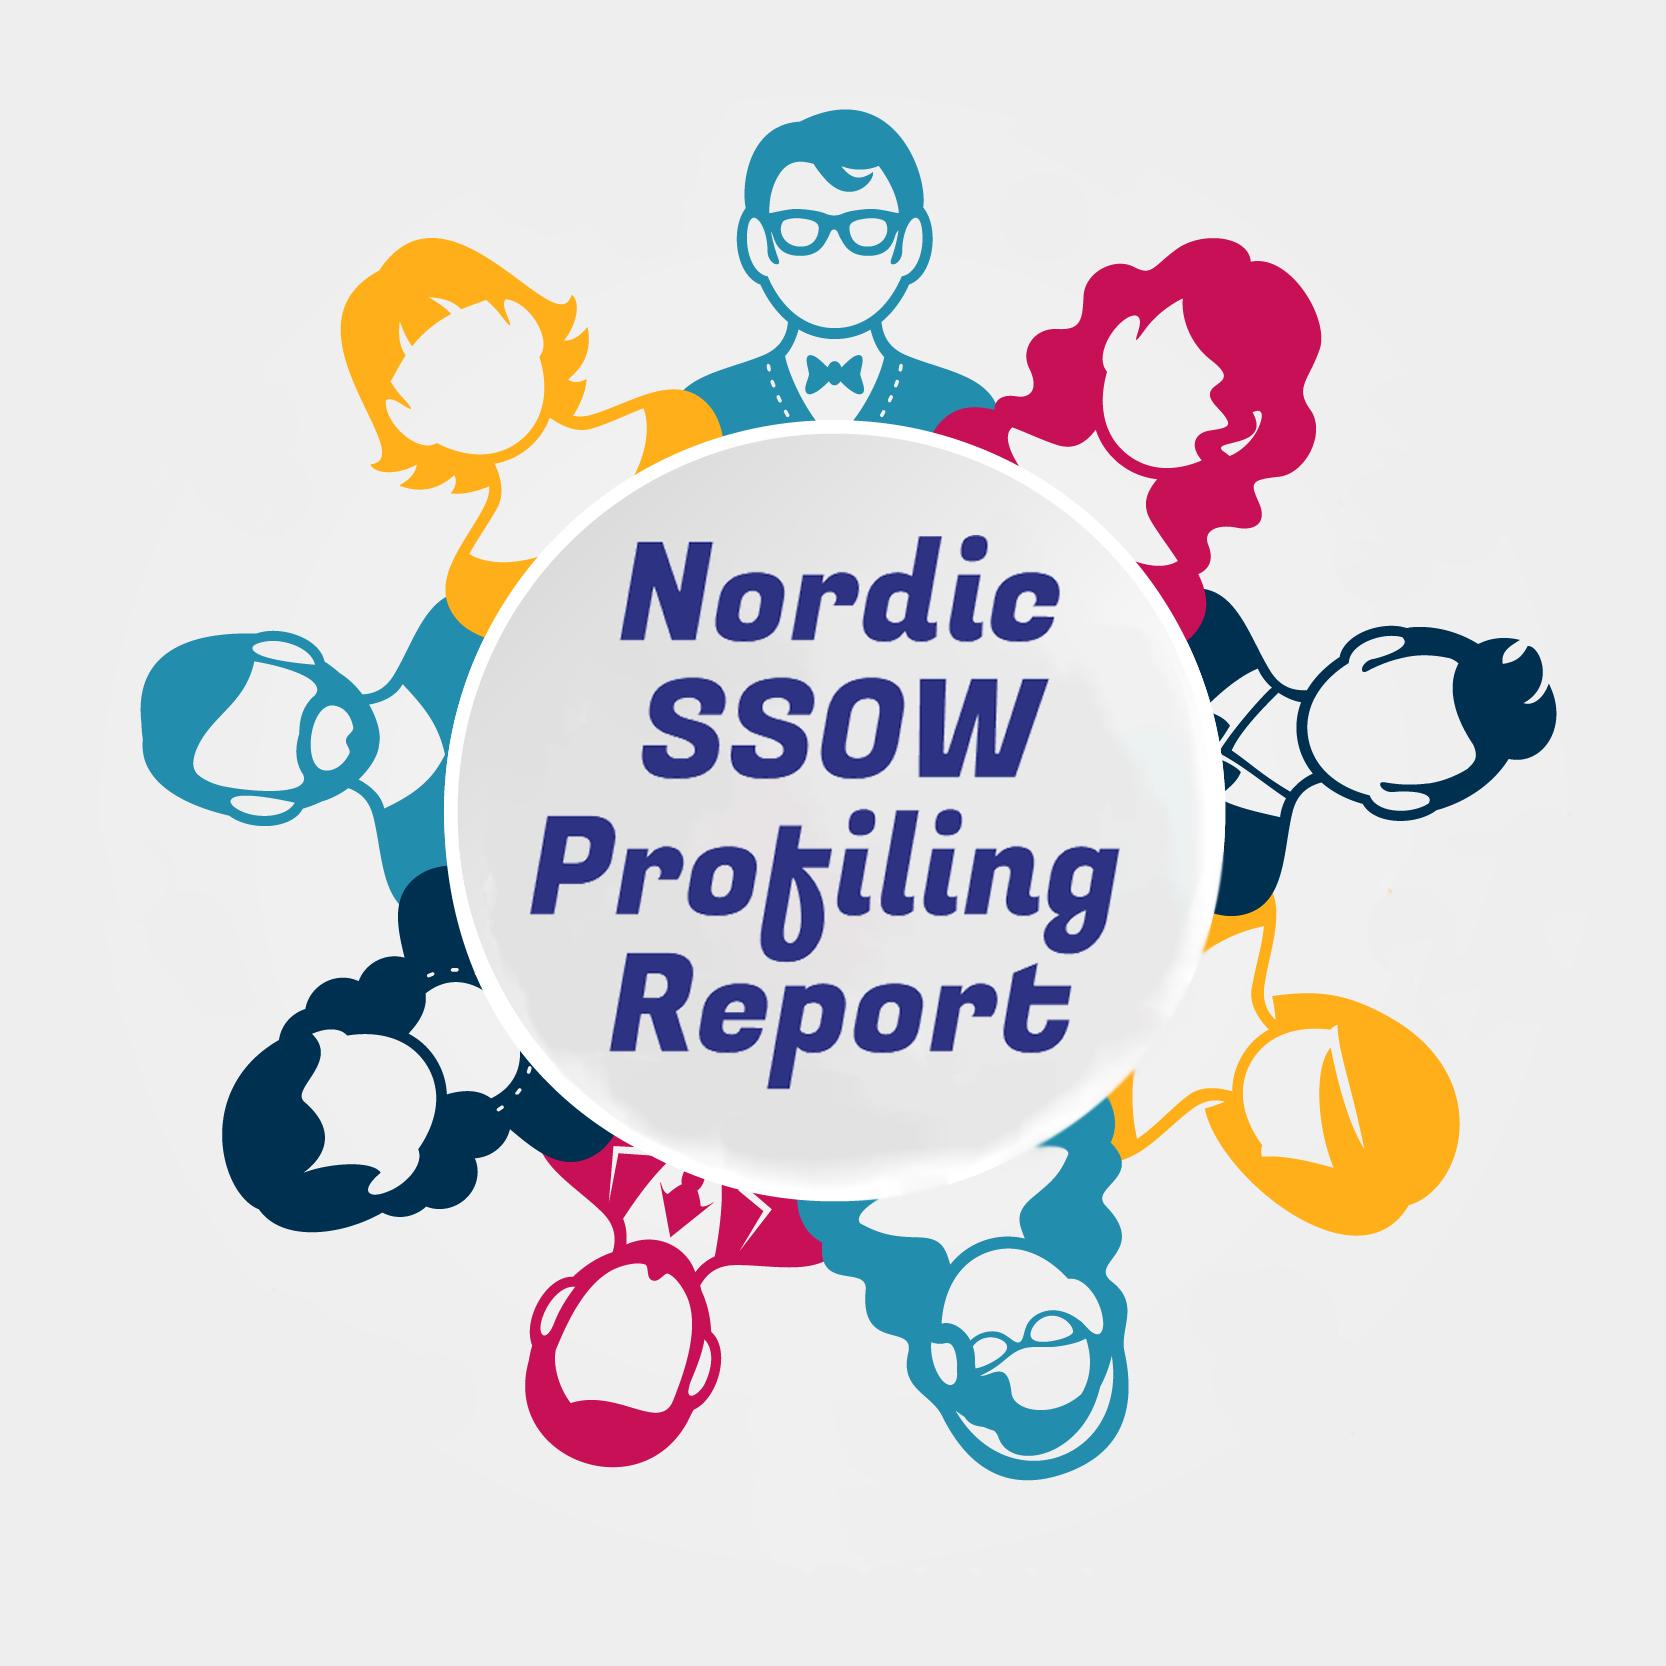 Nordic SSOW 2017 Profiling Report